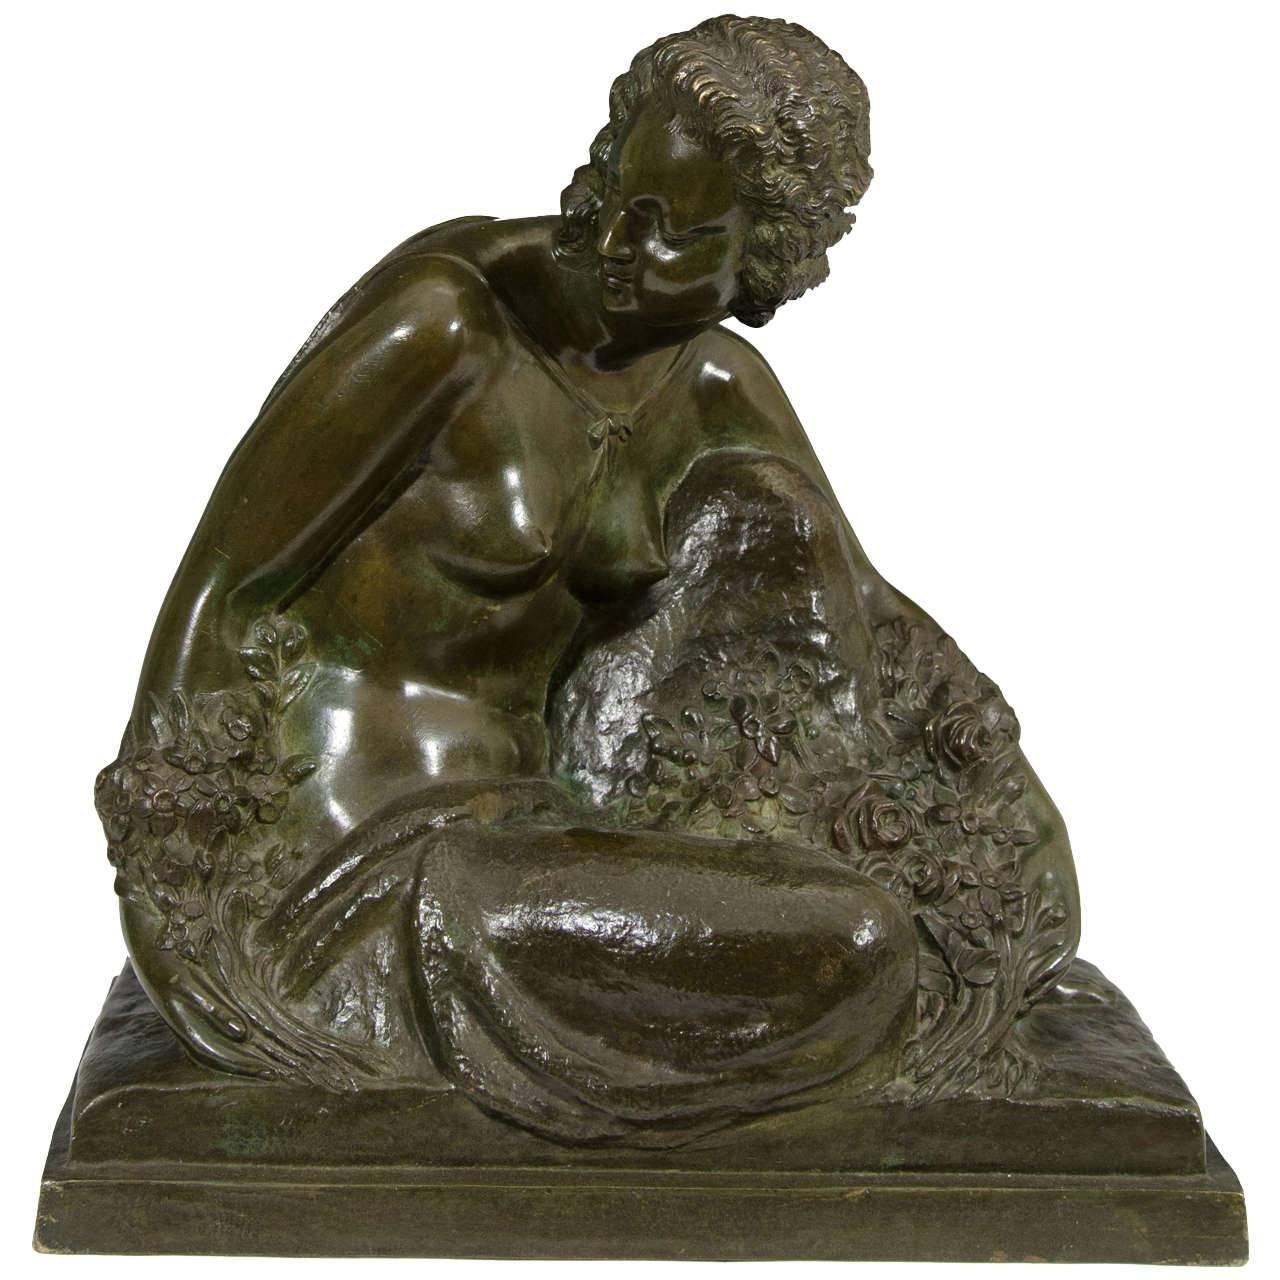 Marcel-André Bouraine, Nude, French Art Deco Bronze Sculpture, circa 1920s